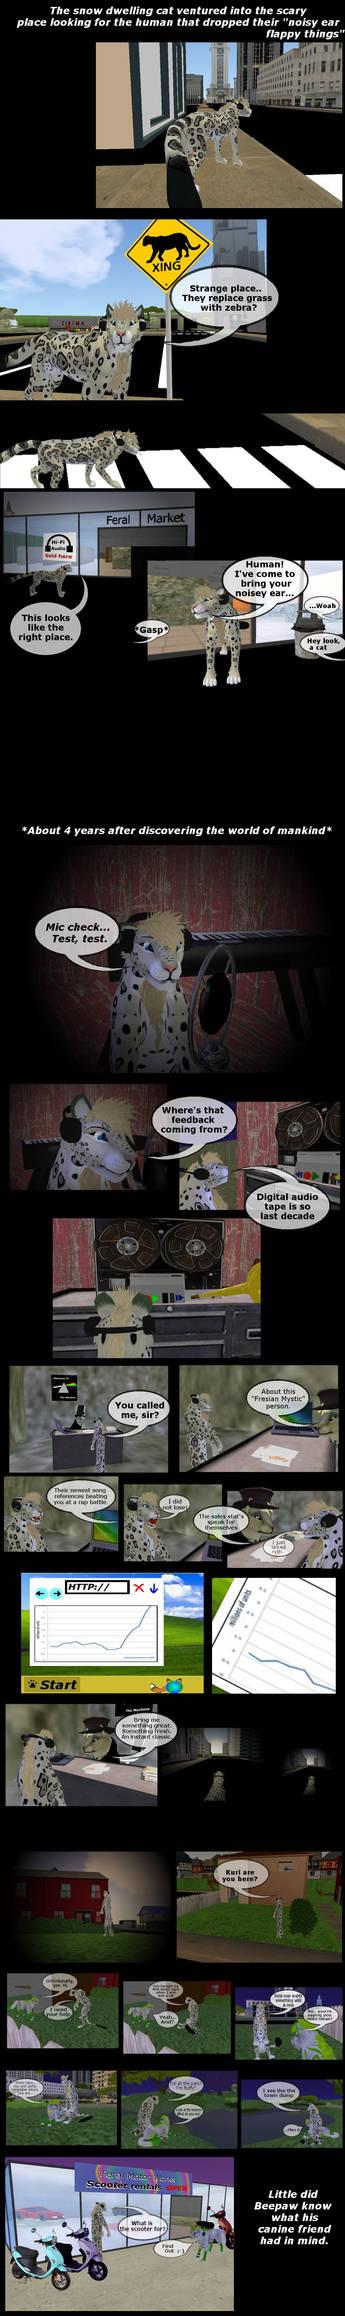 Beepaw the Snowcat Comic page 2